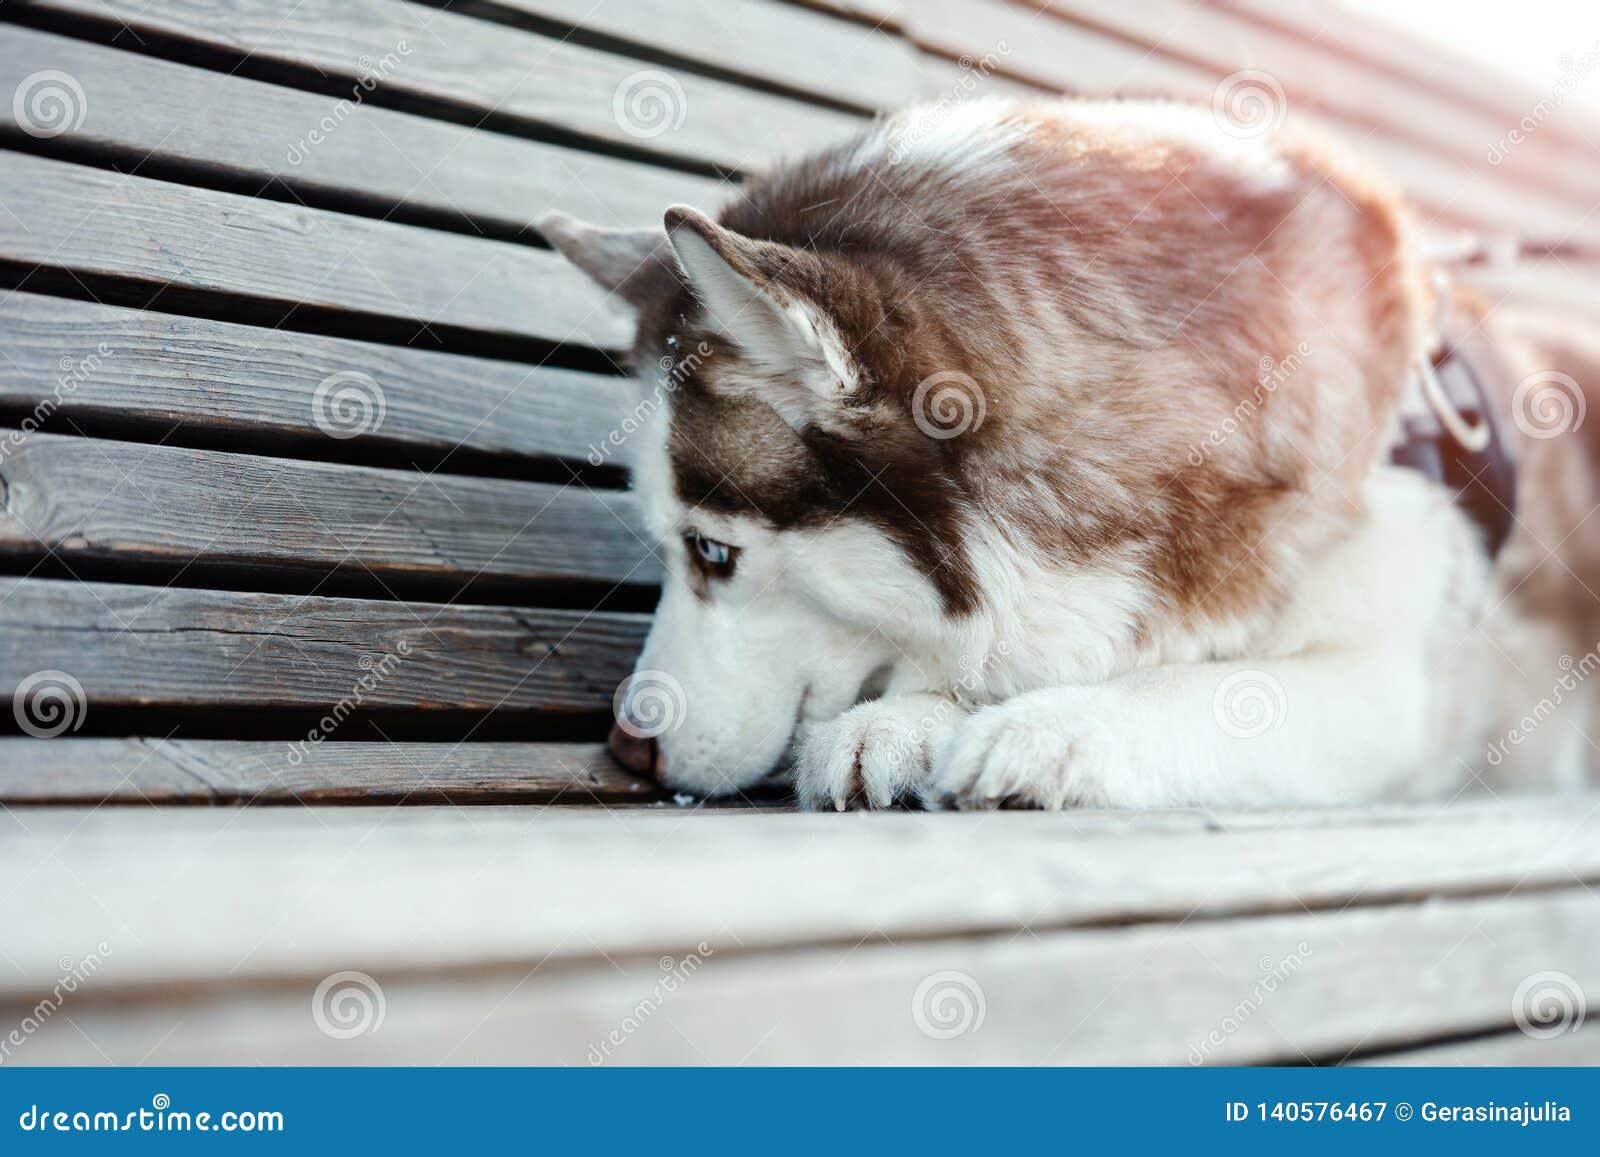 Portrait of sad cute Siberian Husky dog on a walk. Dog Lost his owner